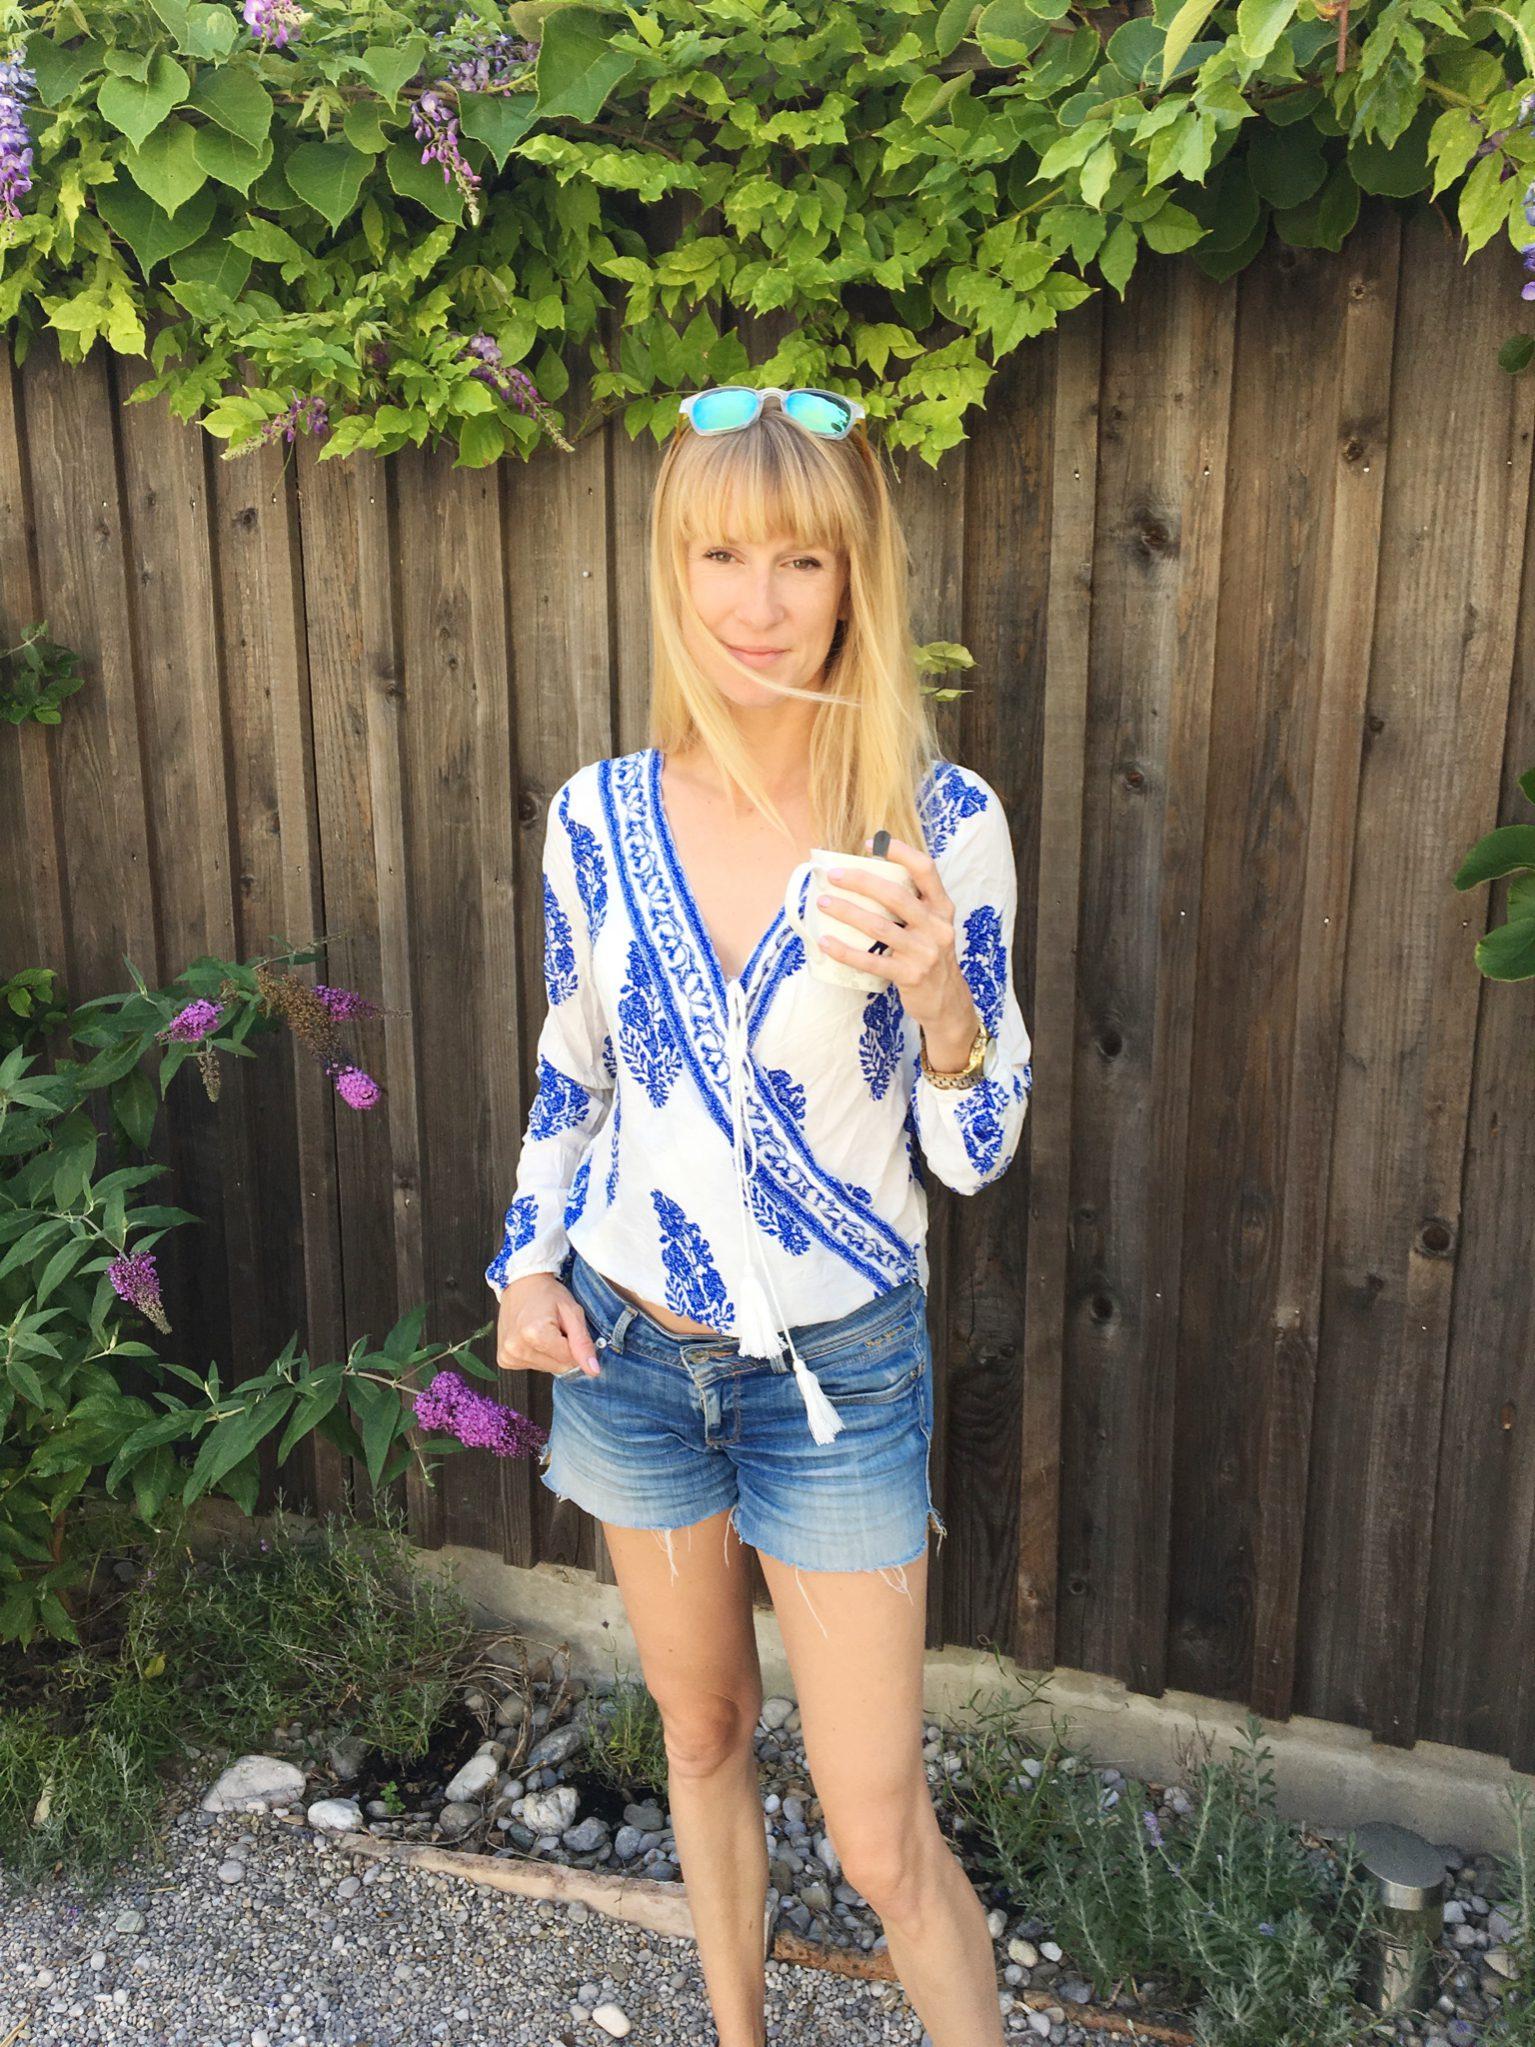 Tunika, Shein, blaue Tunika, Sommerlook, Modemama, Kaffee am Morgen, Mamablogger, Mamablog, Modeblog, Fashionblog, Jeansshorts, verspiegelte Brille